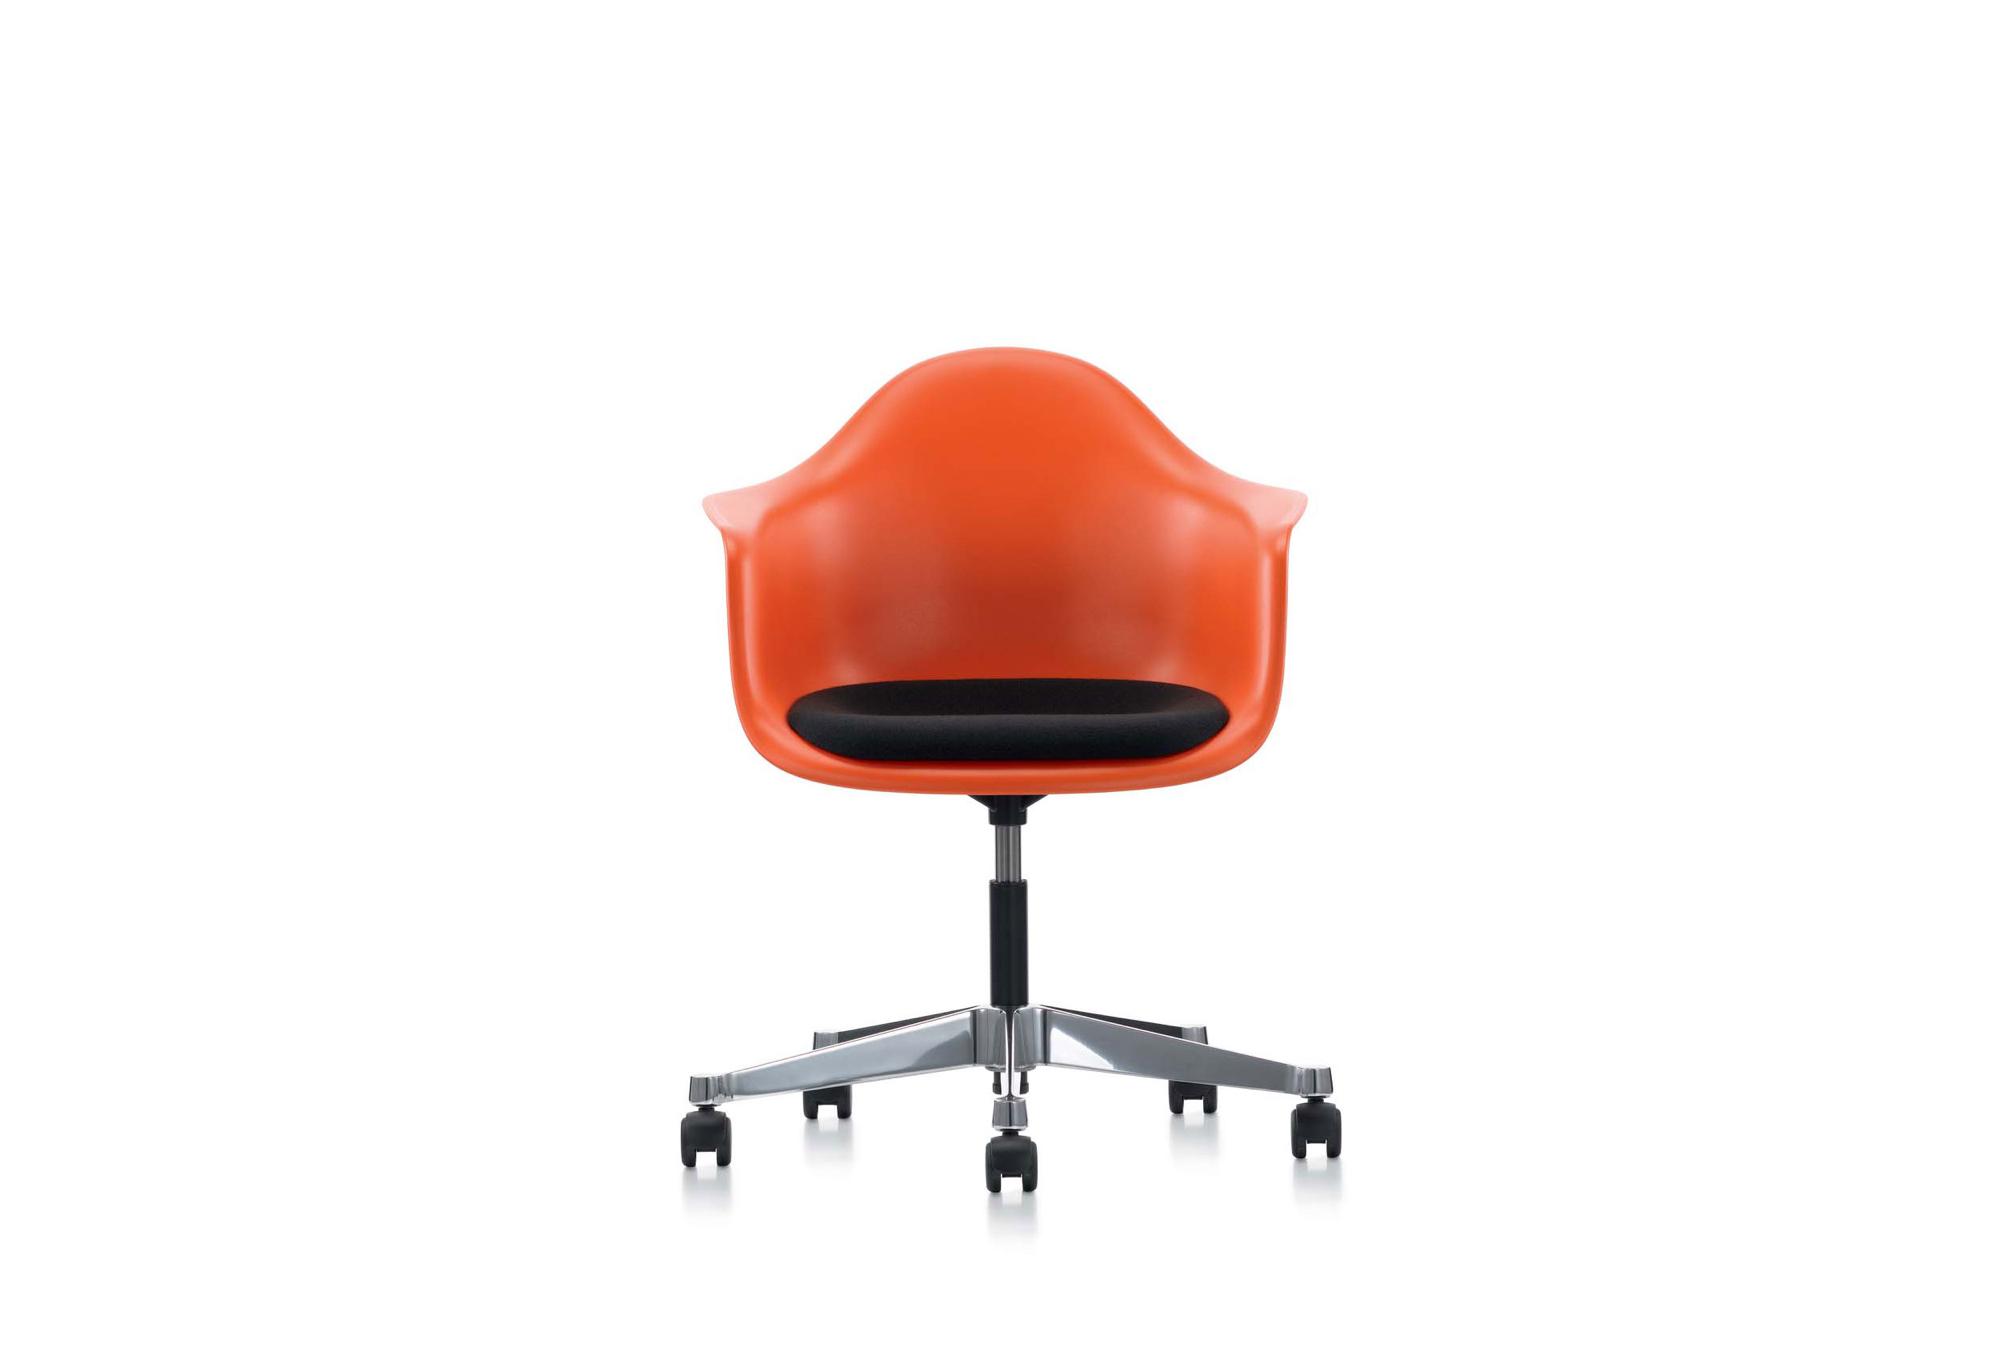 Стулья для офиса, фото модели Eames. Фото 4